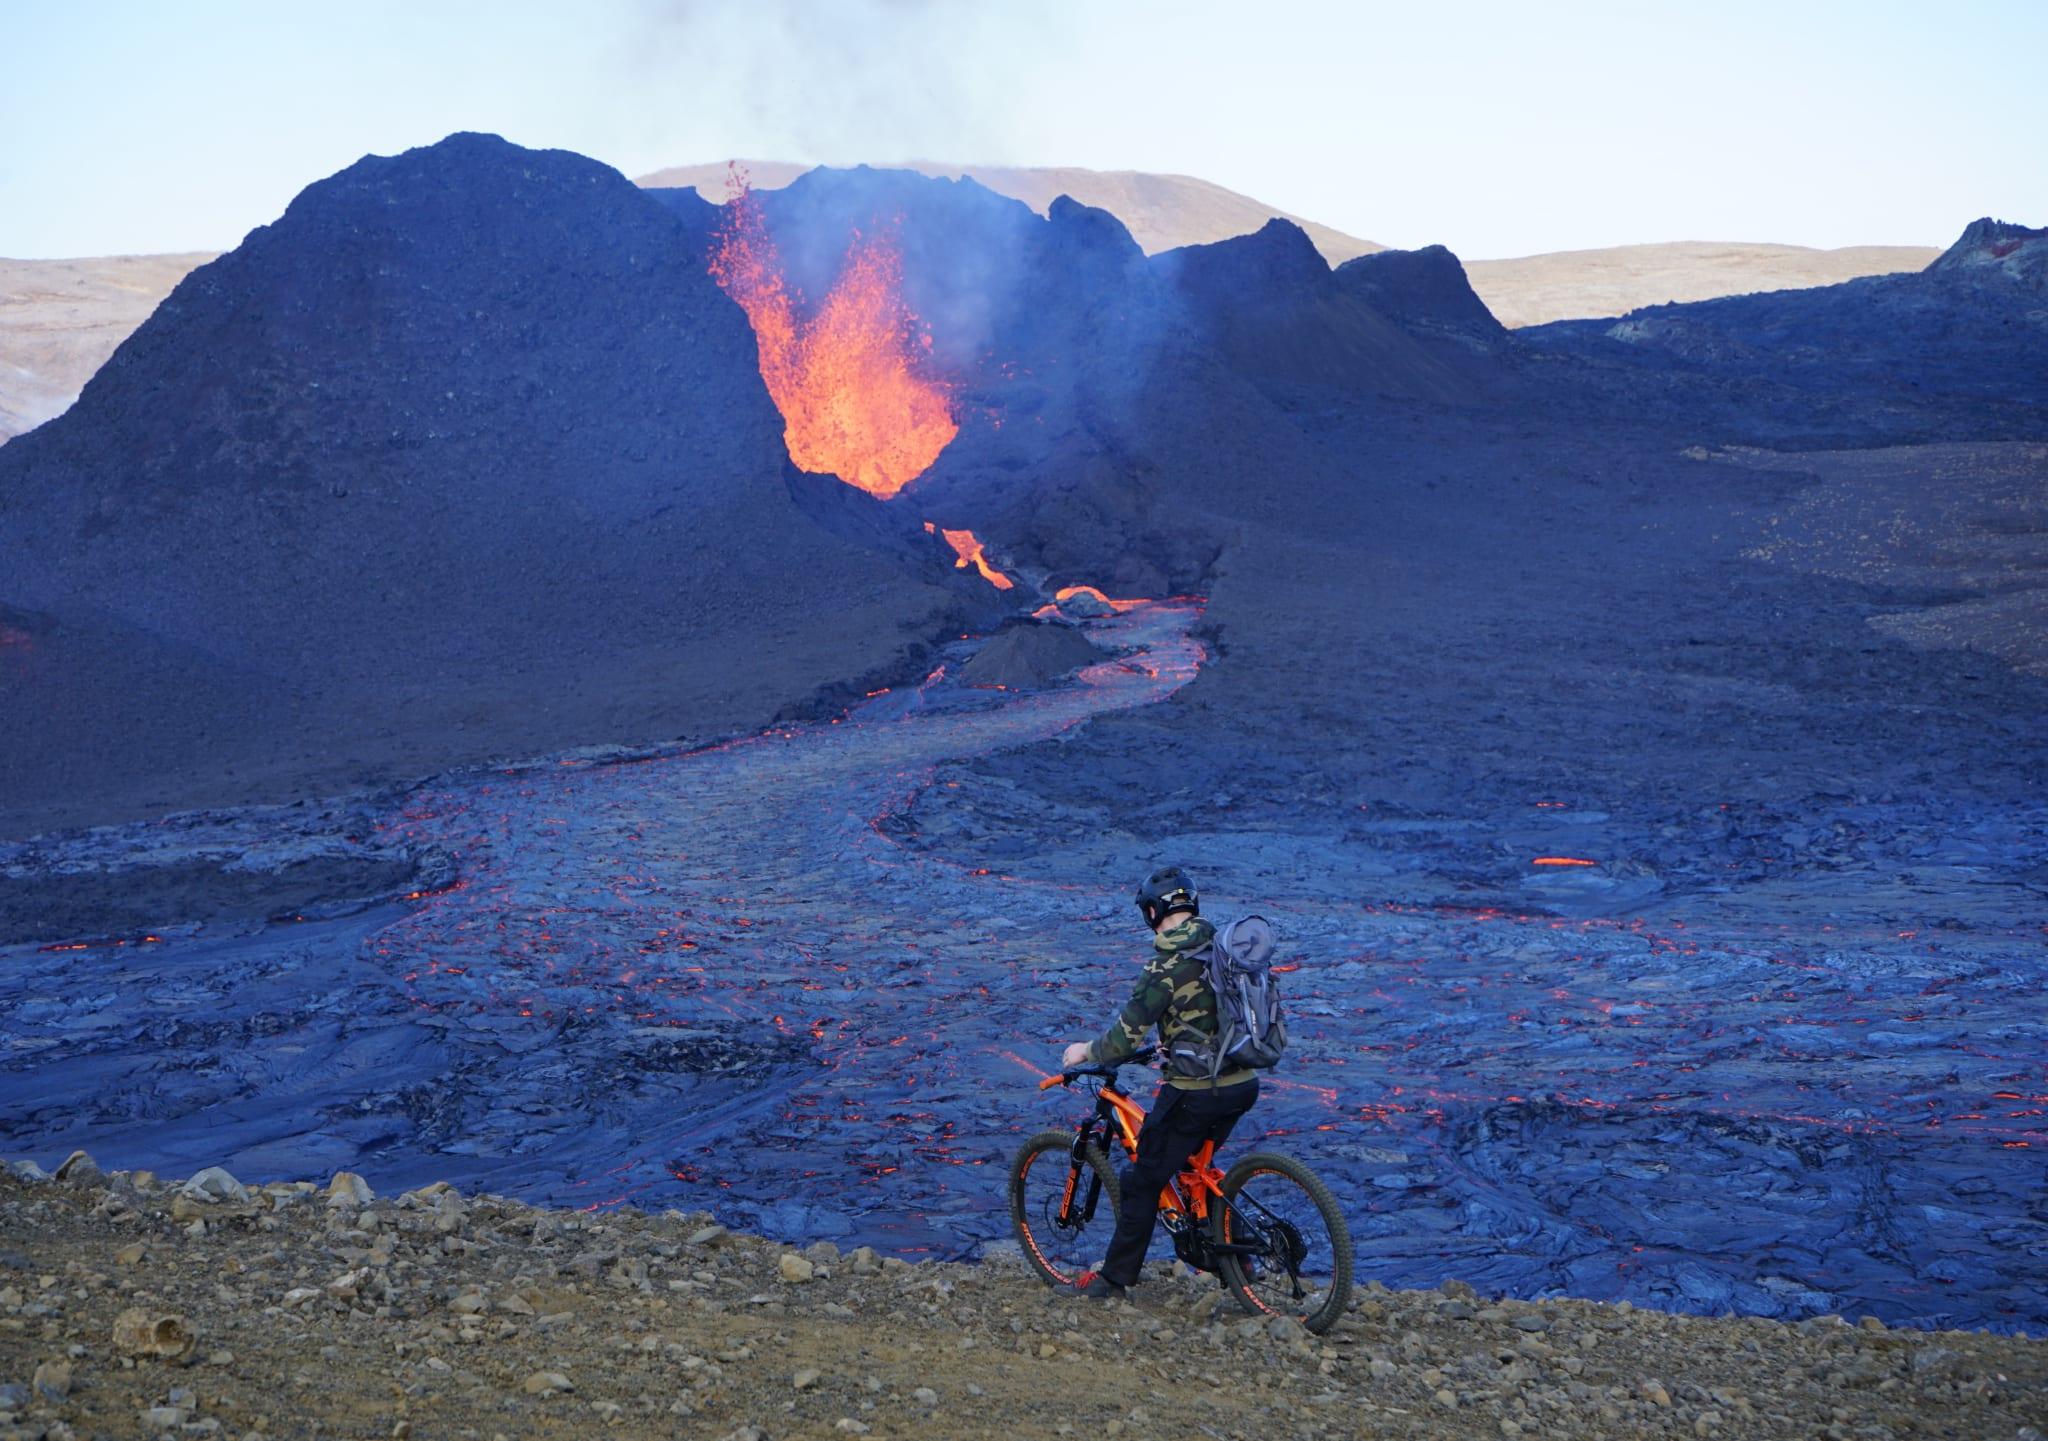 Vulkan Fahrrad Geldingardalur Anne Mai